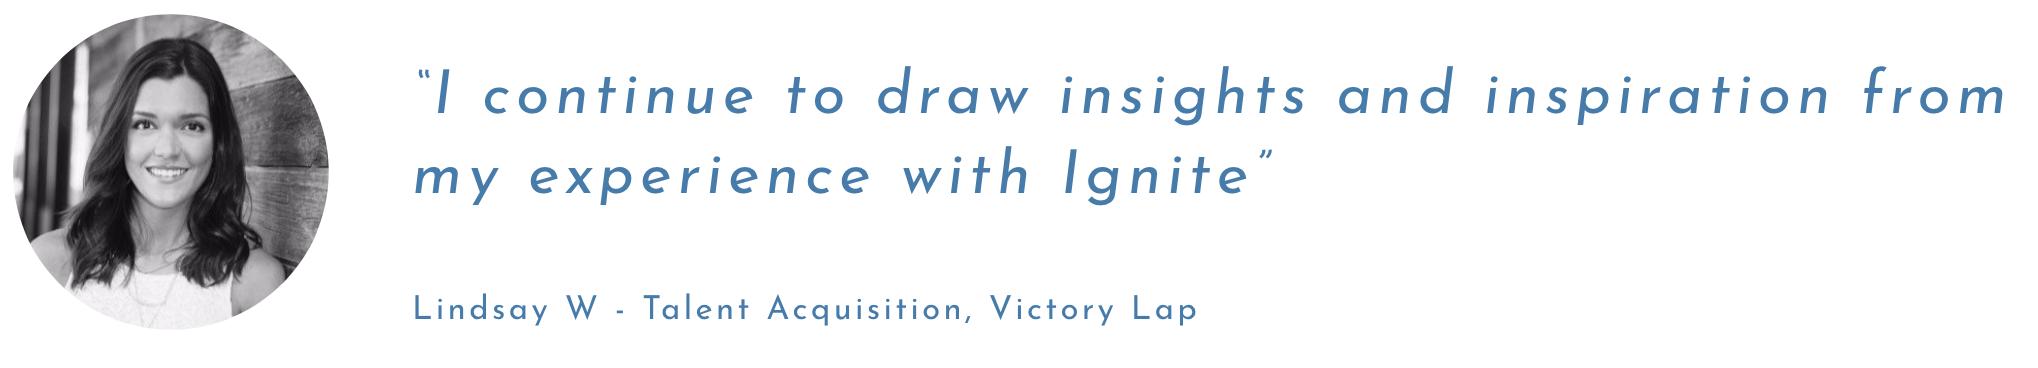 Lindsay leadership development quote rising leader.png